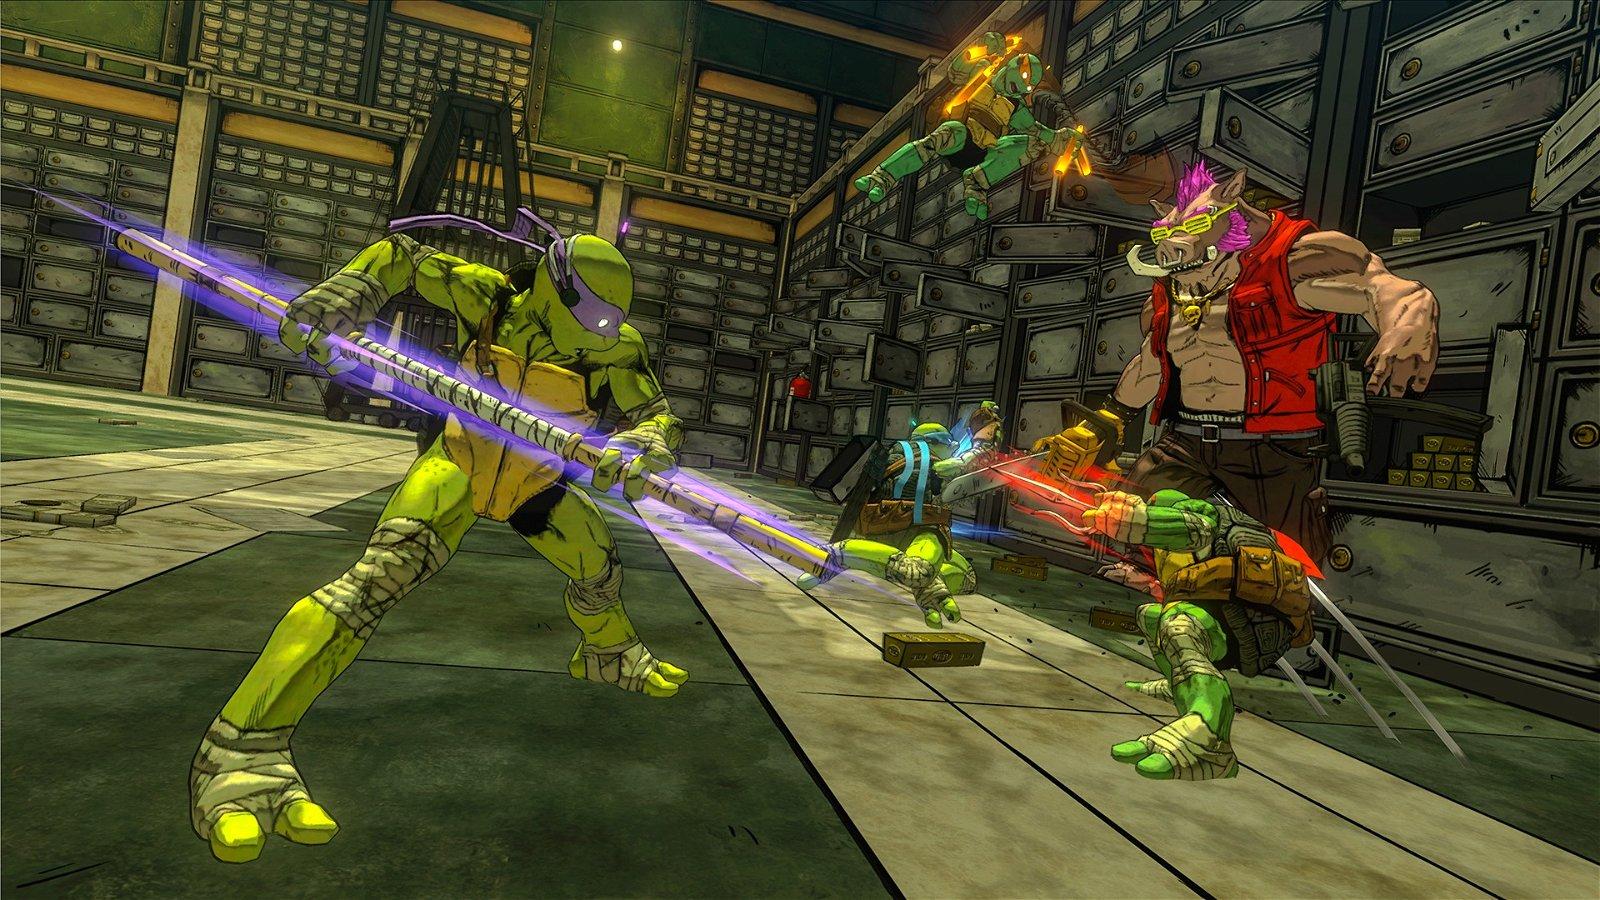 Teenage Mutant Ninja Turtles: Mutants In Manhattan (Ps4) Review 6